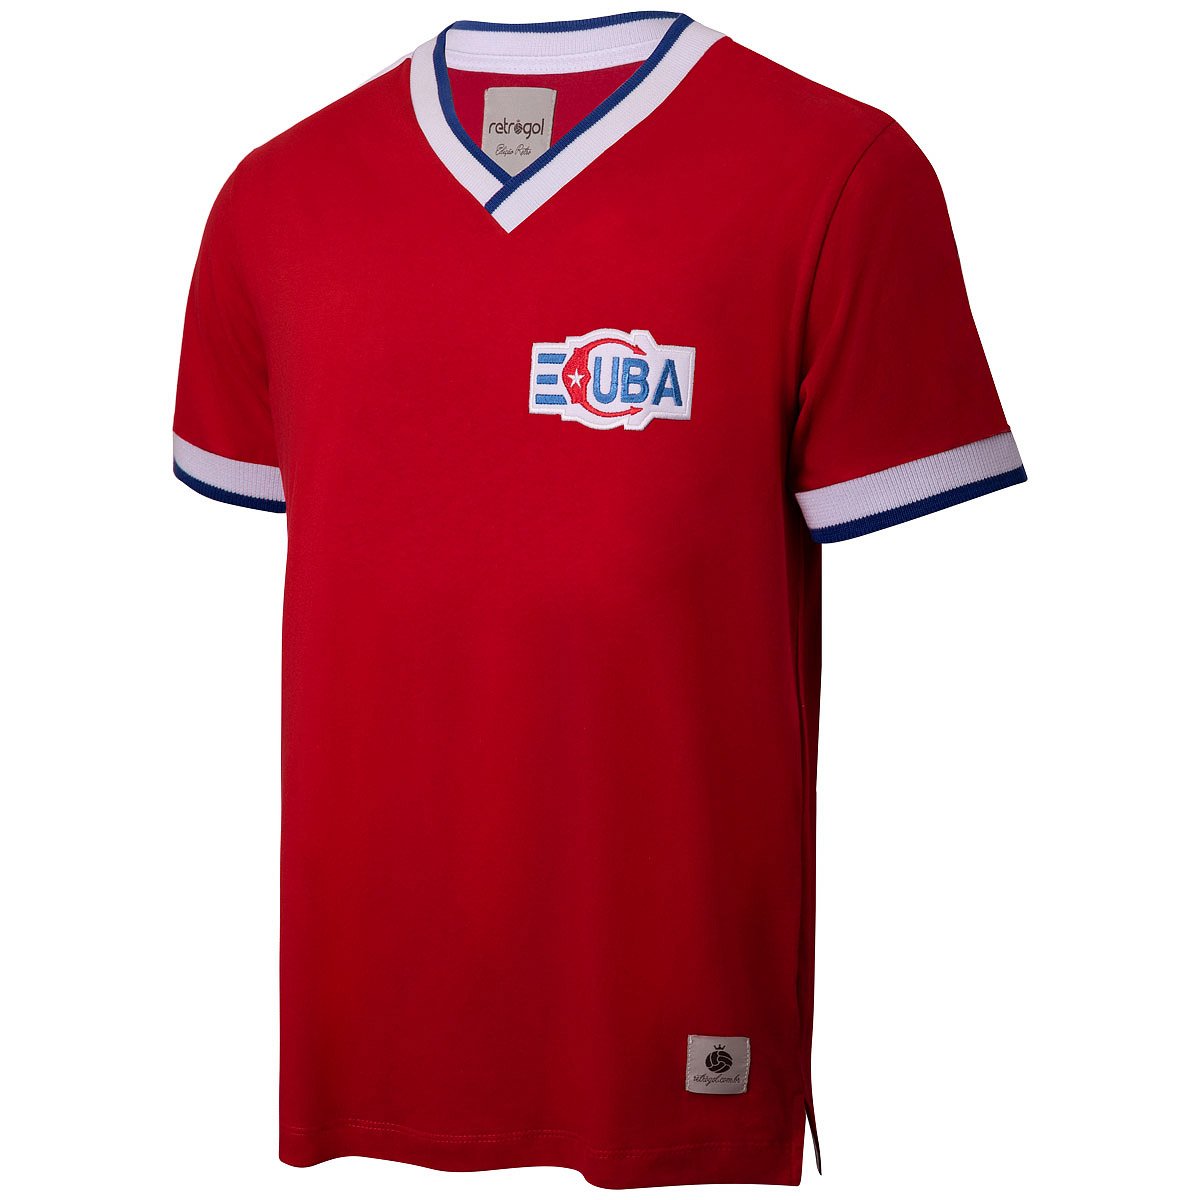 Camisa Cuba Retrô Anos 80 Masculina